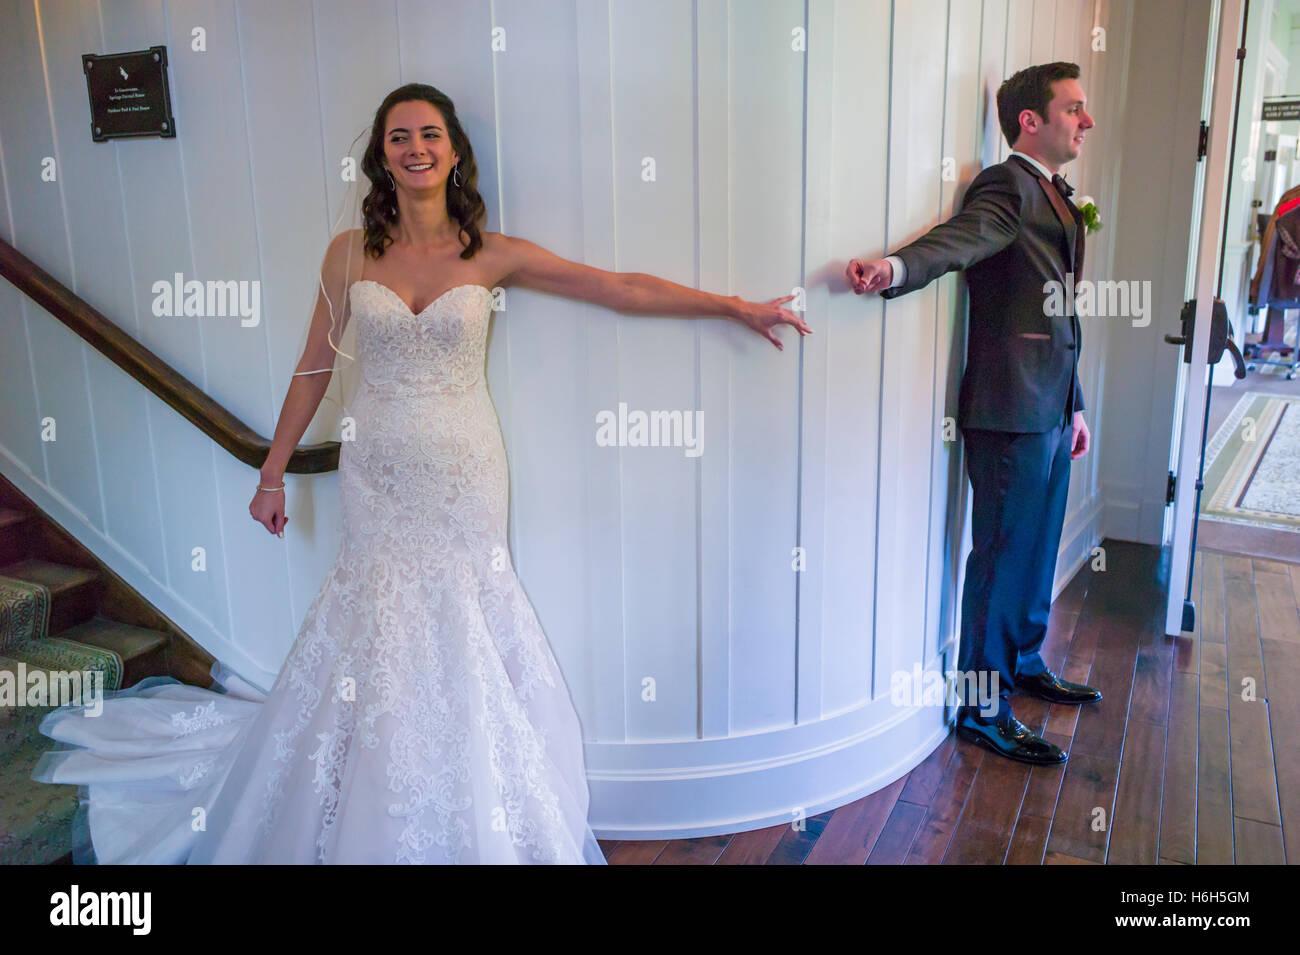 Wedding Bride Groom Before The First Look Ceremony Omni Bedford Springs Resort Spa Pennsylvania USA